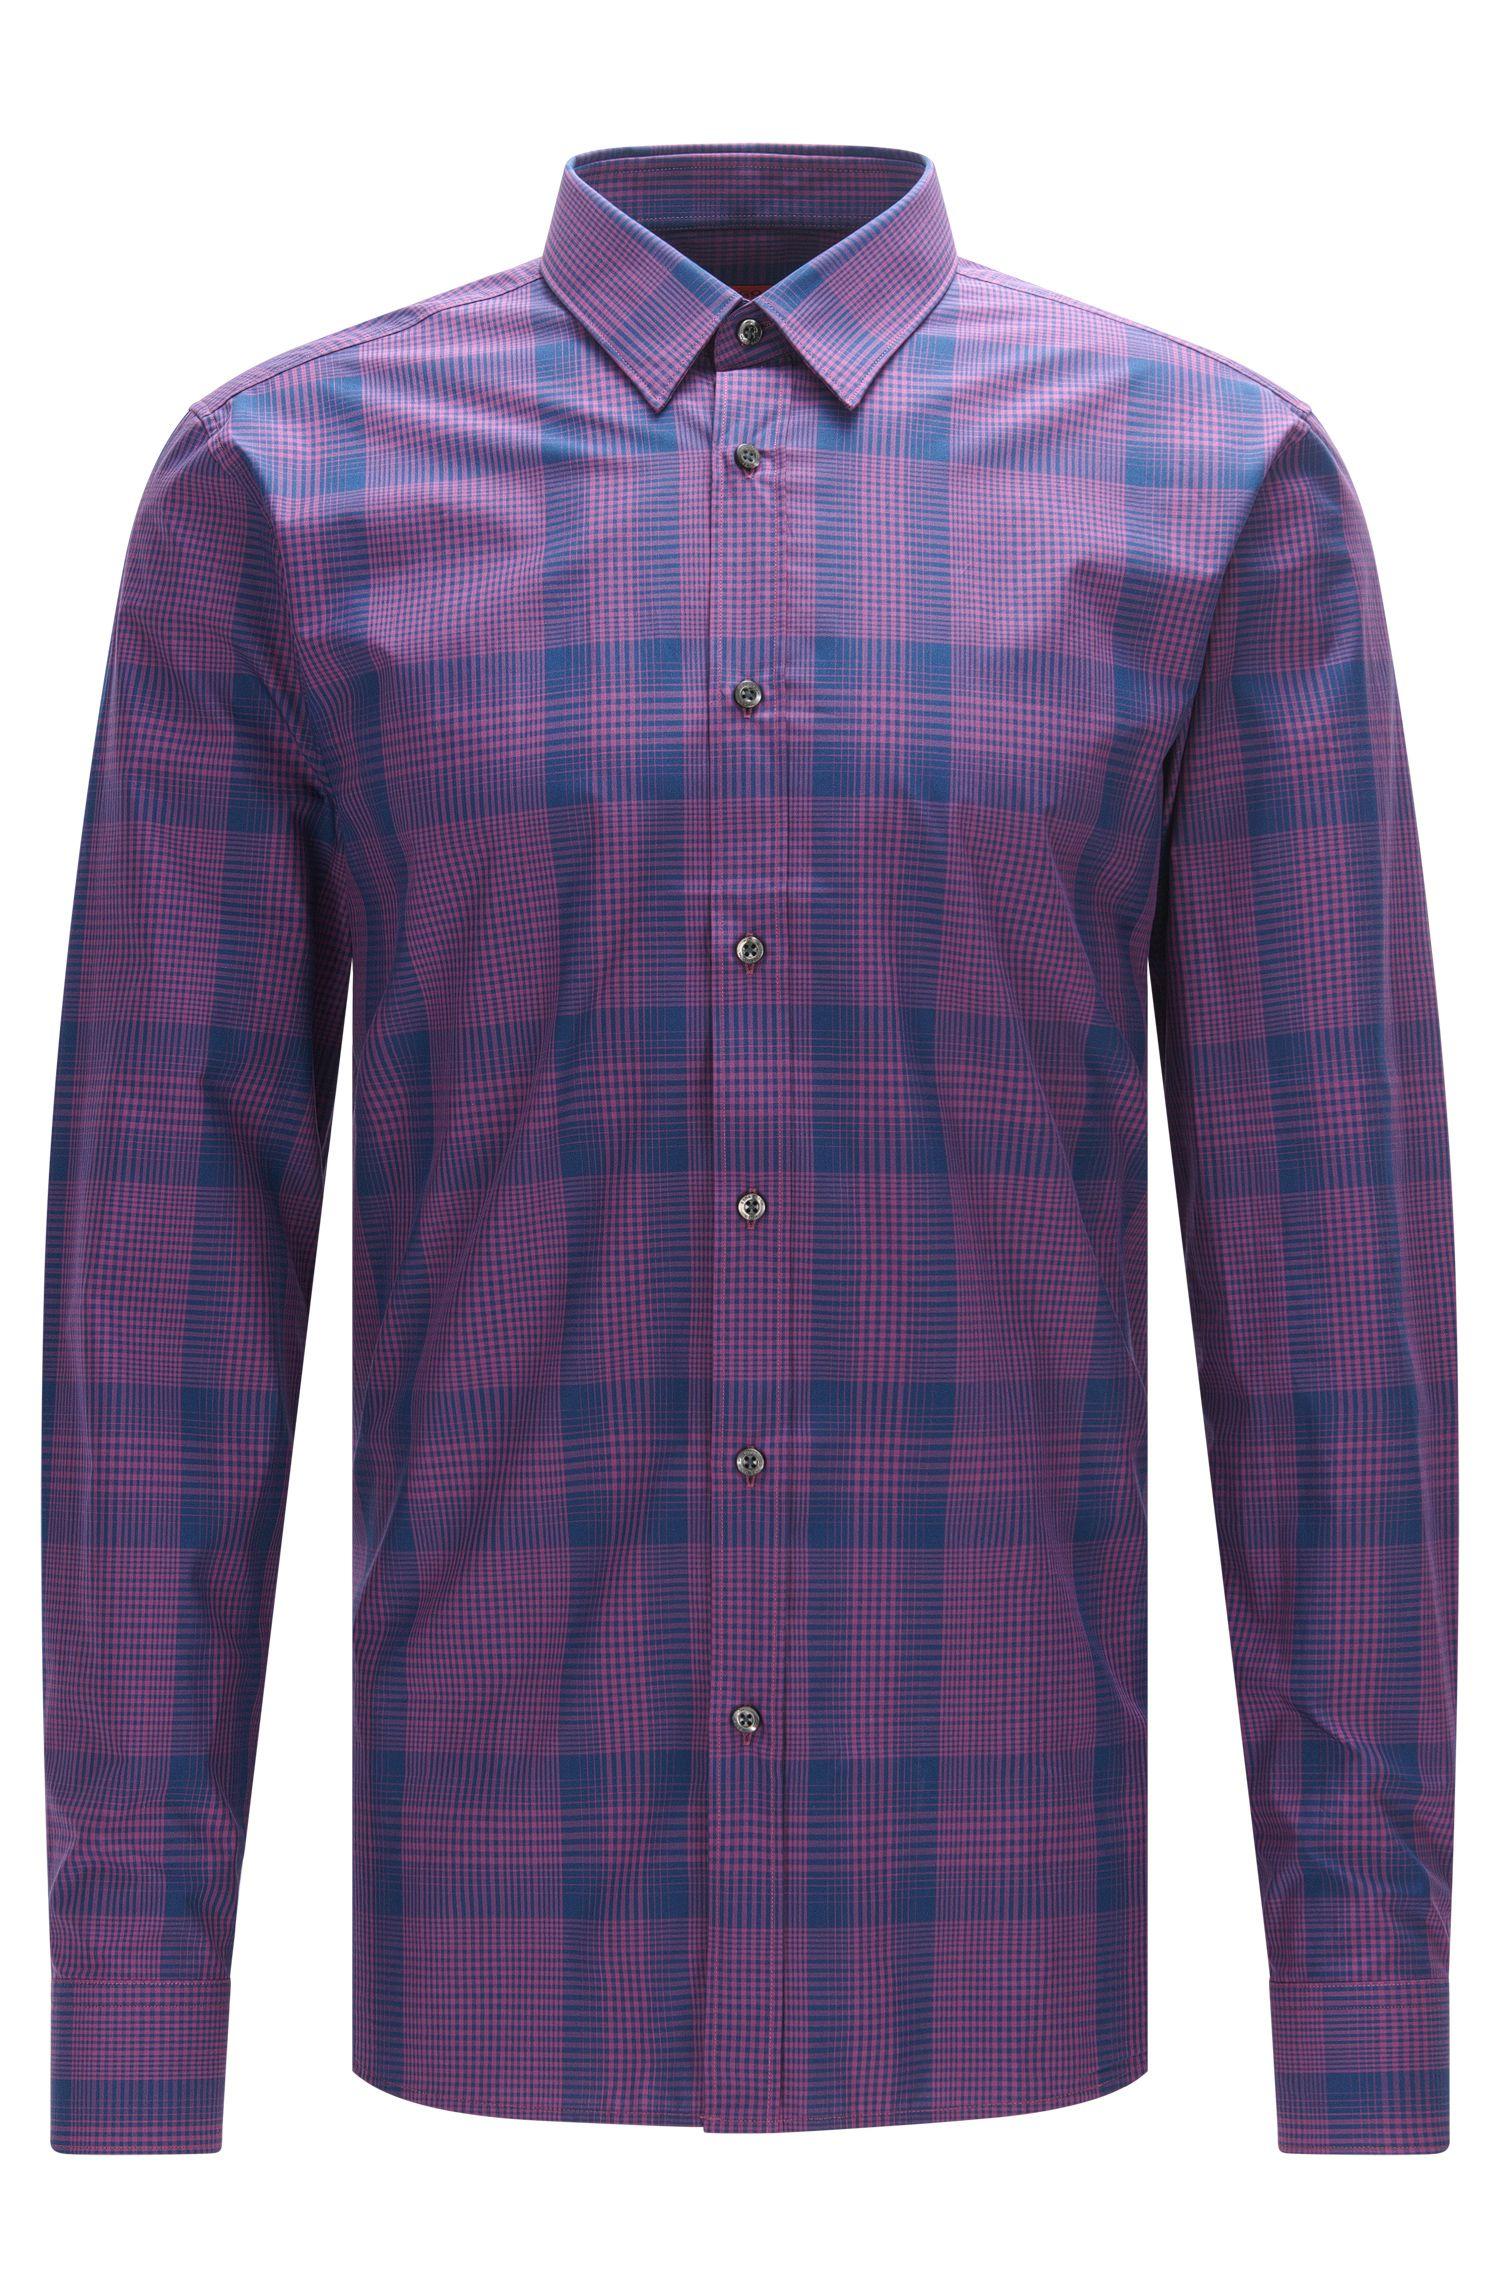 'Elisha' | Extra Slim Fit, Cotton Button Down Shirt